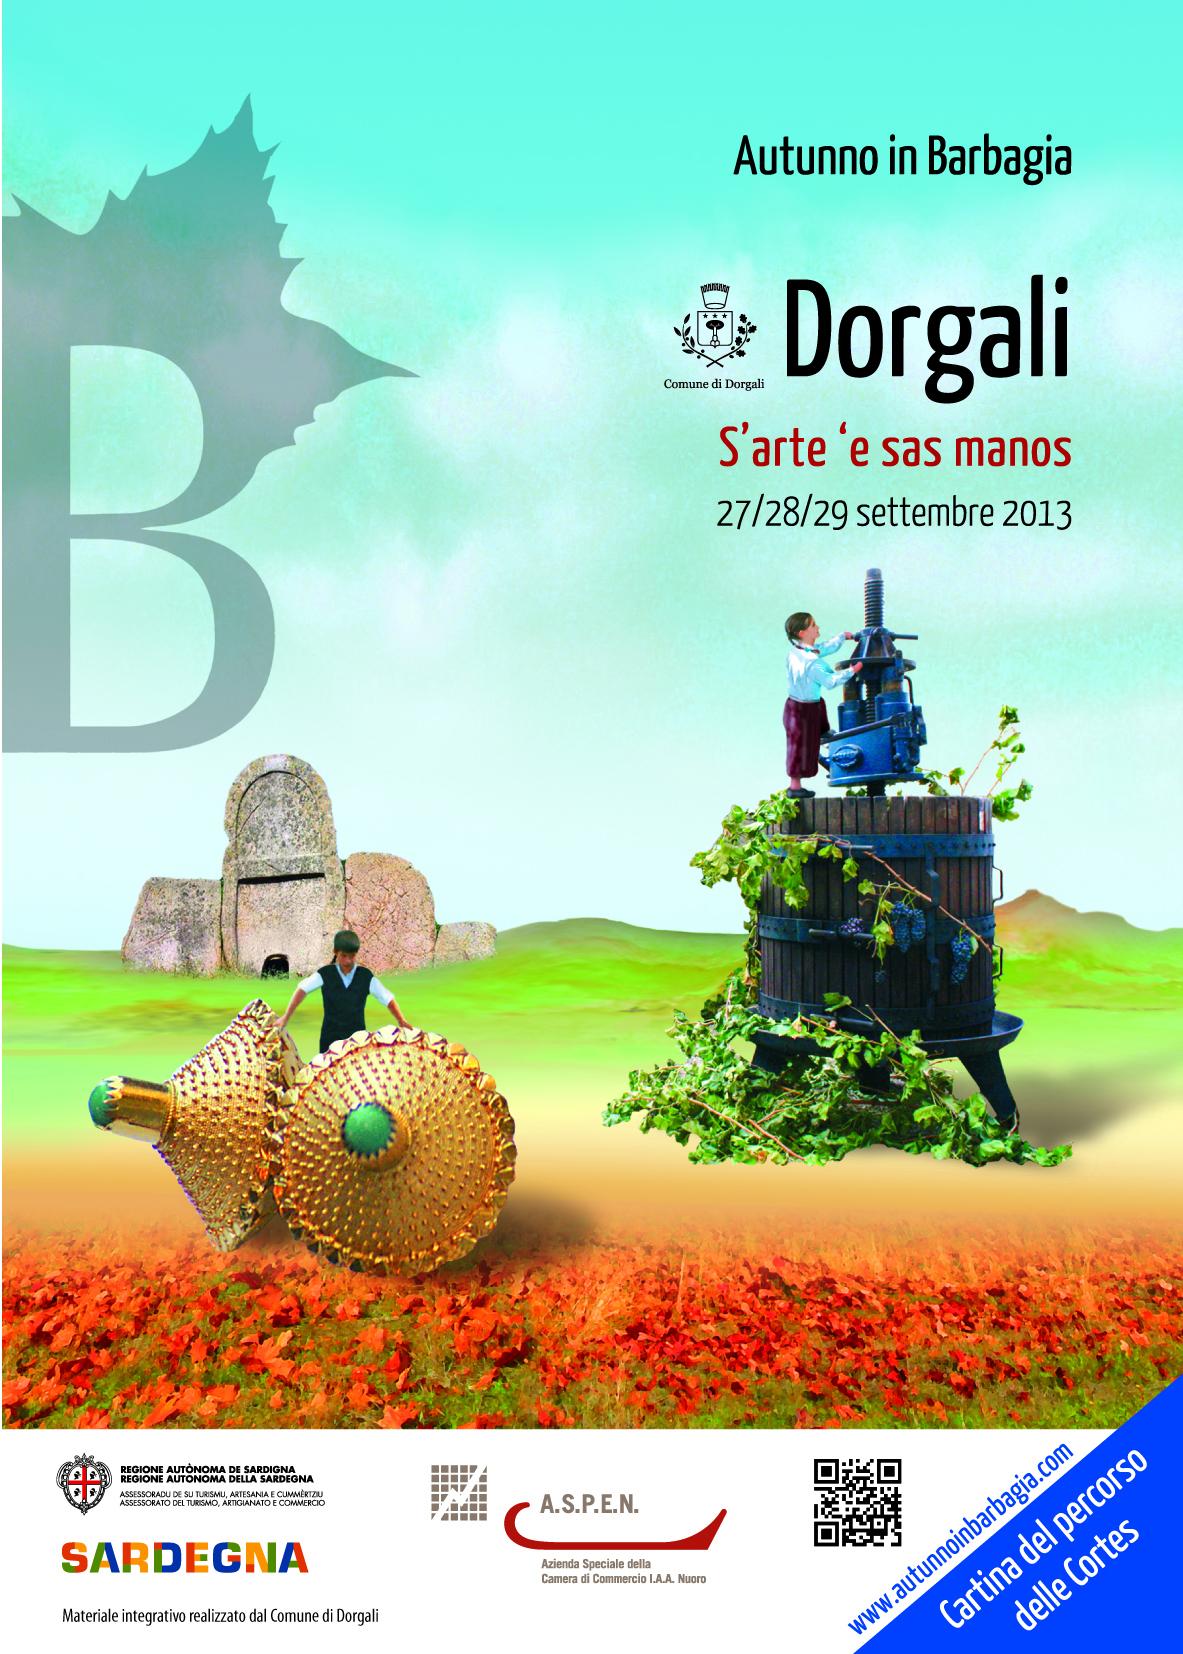 Dorgali Cortes Apertas 2013 Programma Completo